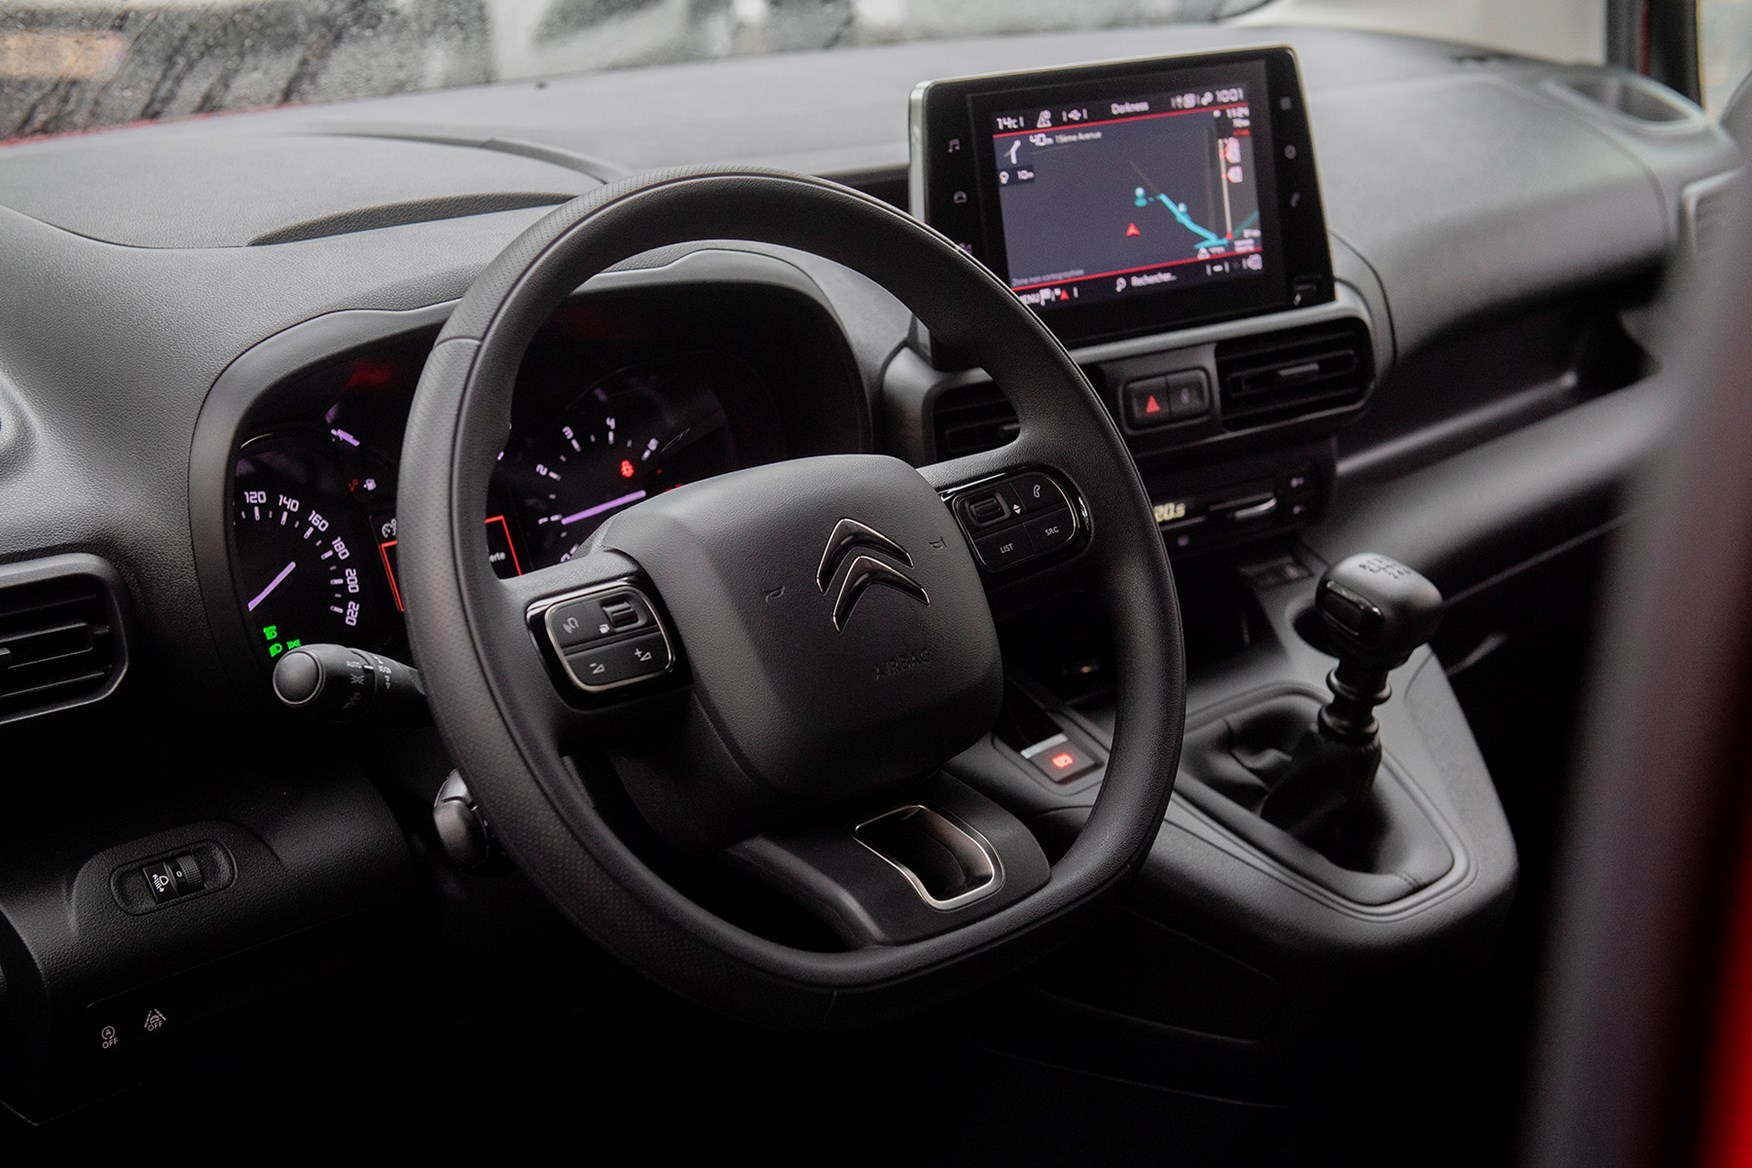 Citroen Berlingo review - cab interior, steering wheel, dashboard, infotainment